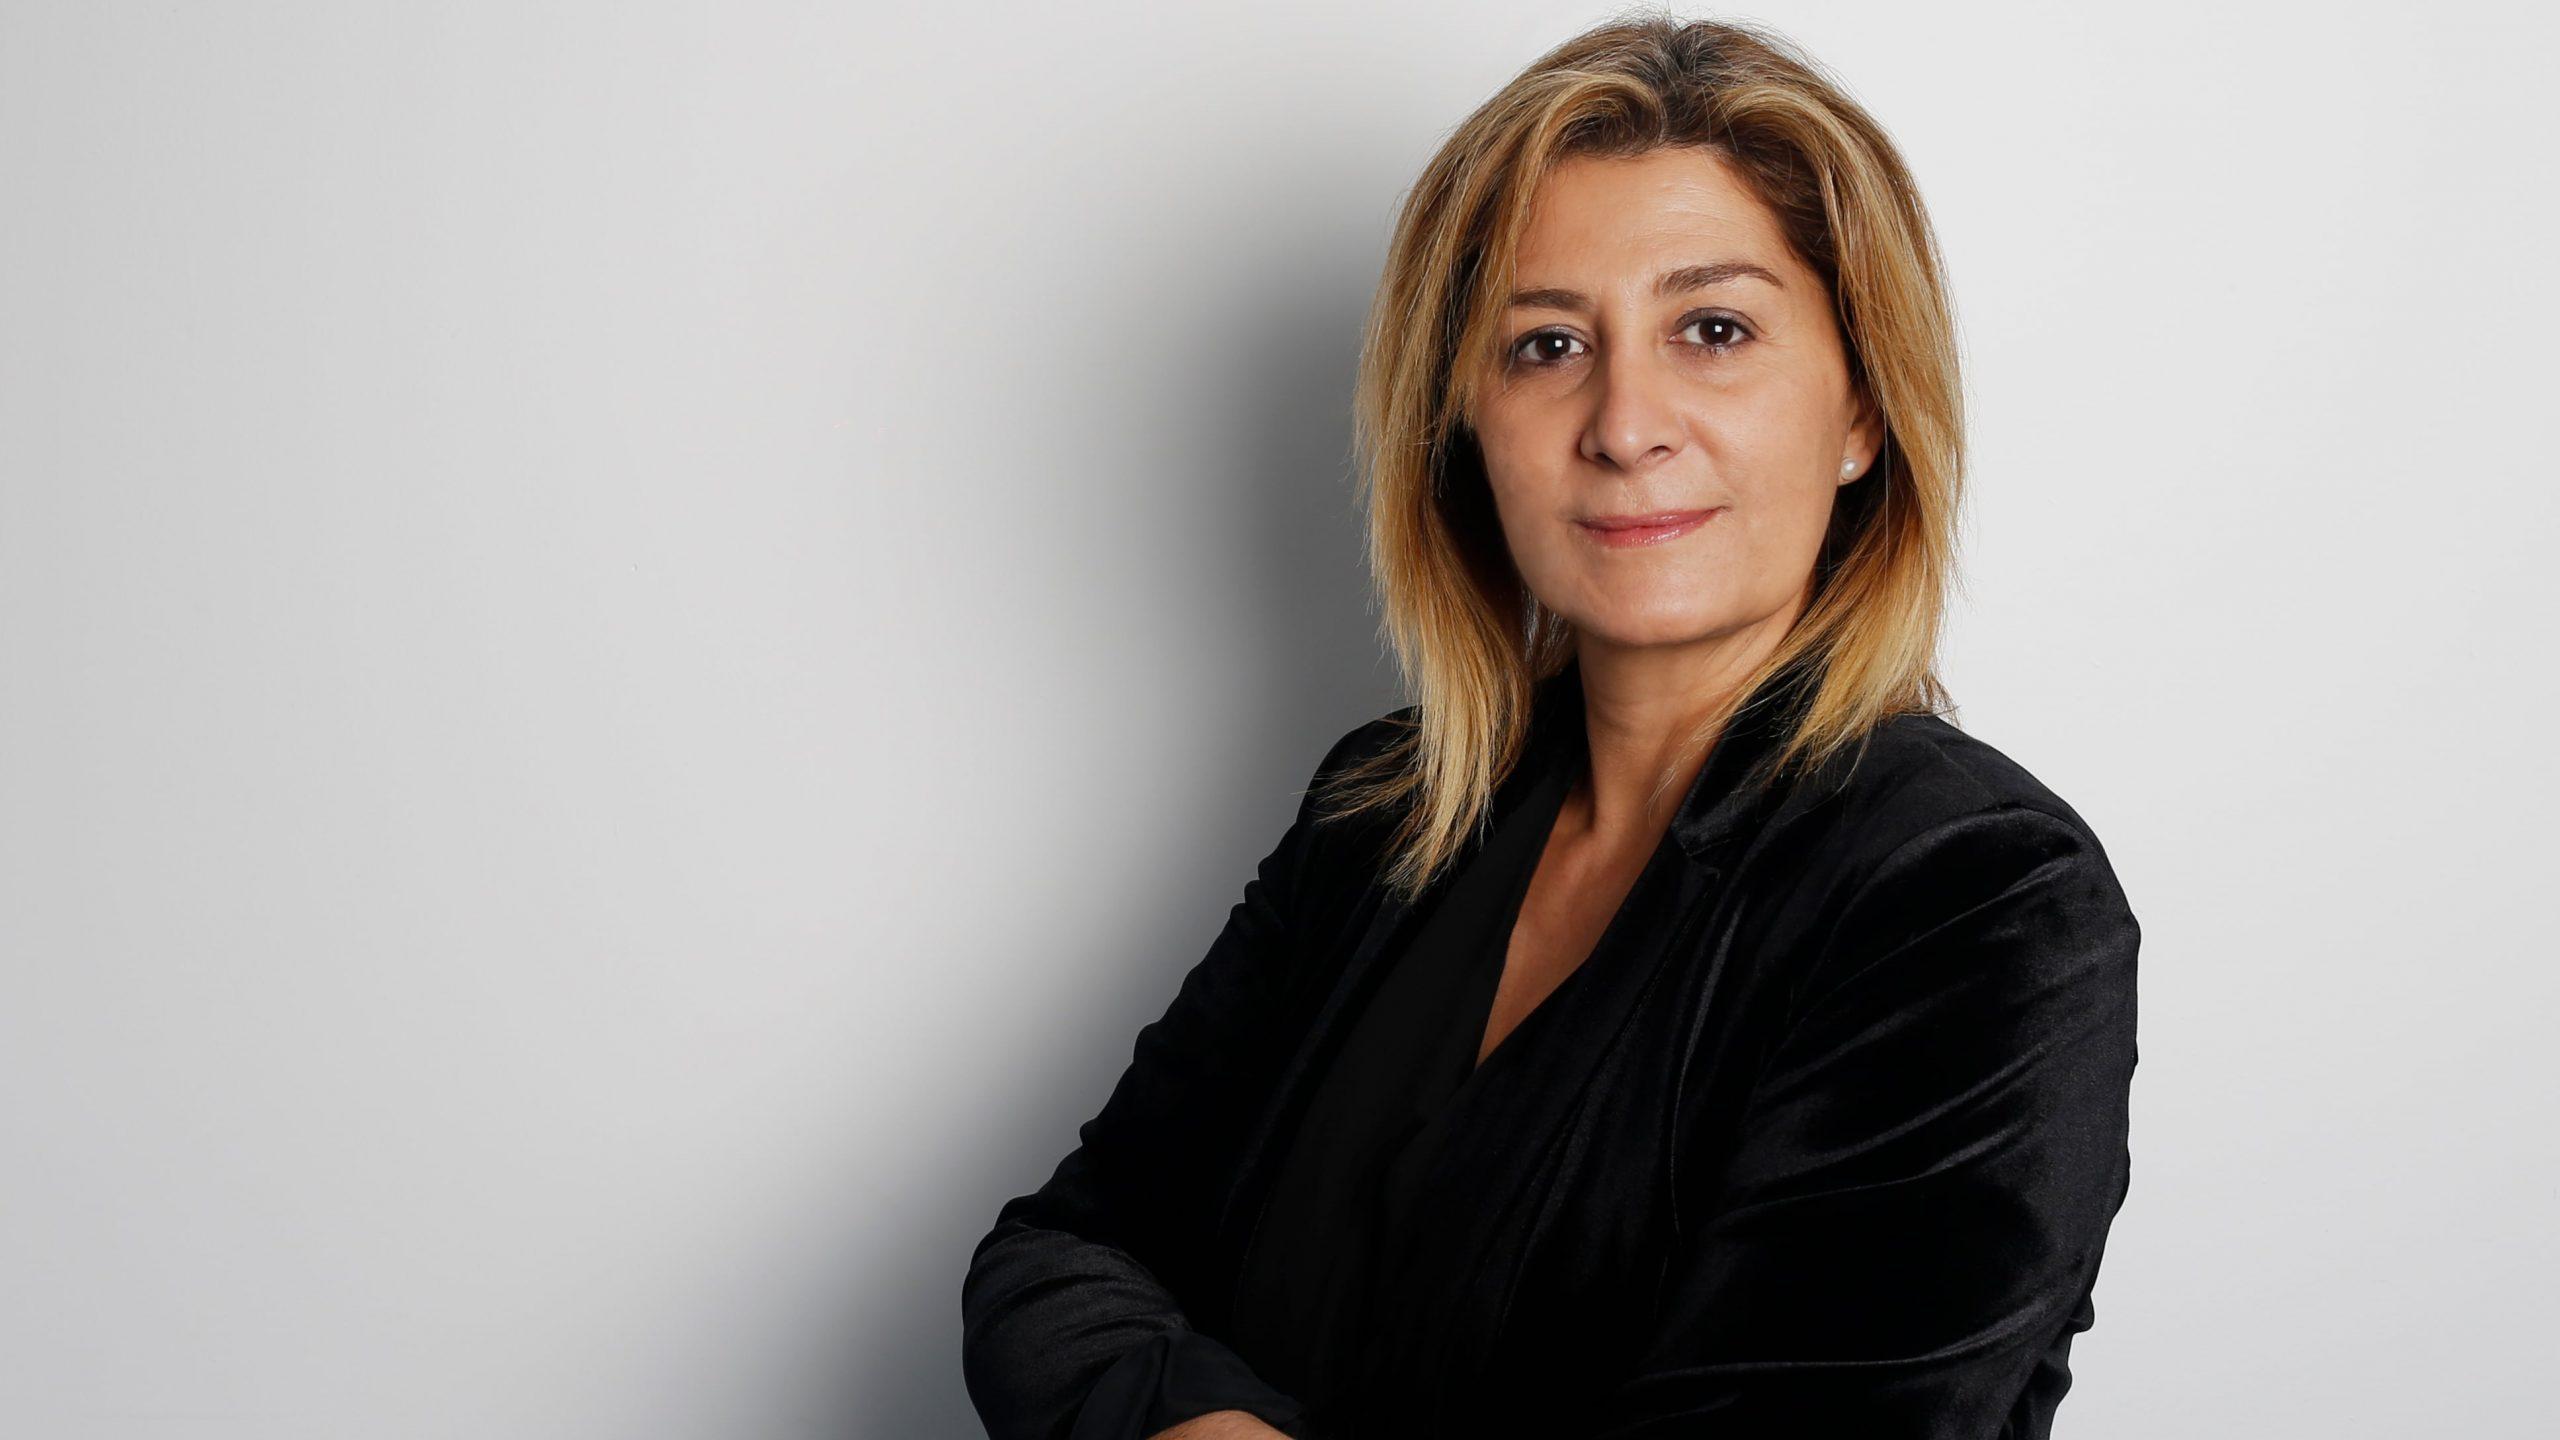 Belén Martín, directora general de Restalia @Restalia